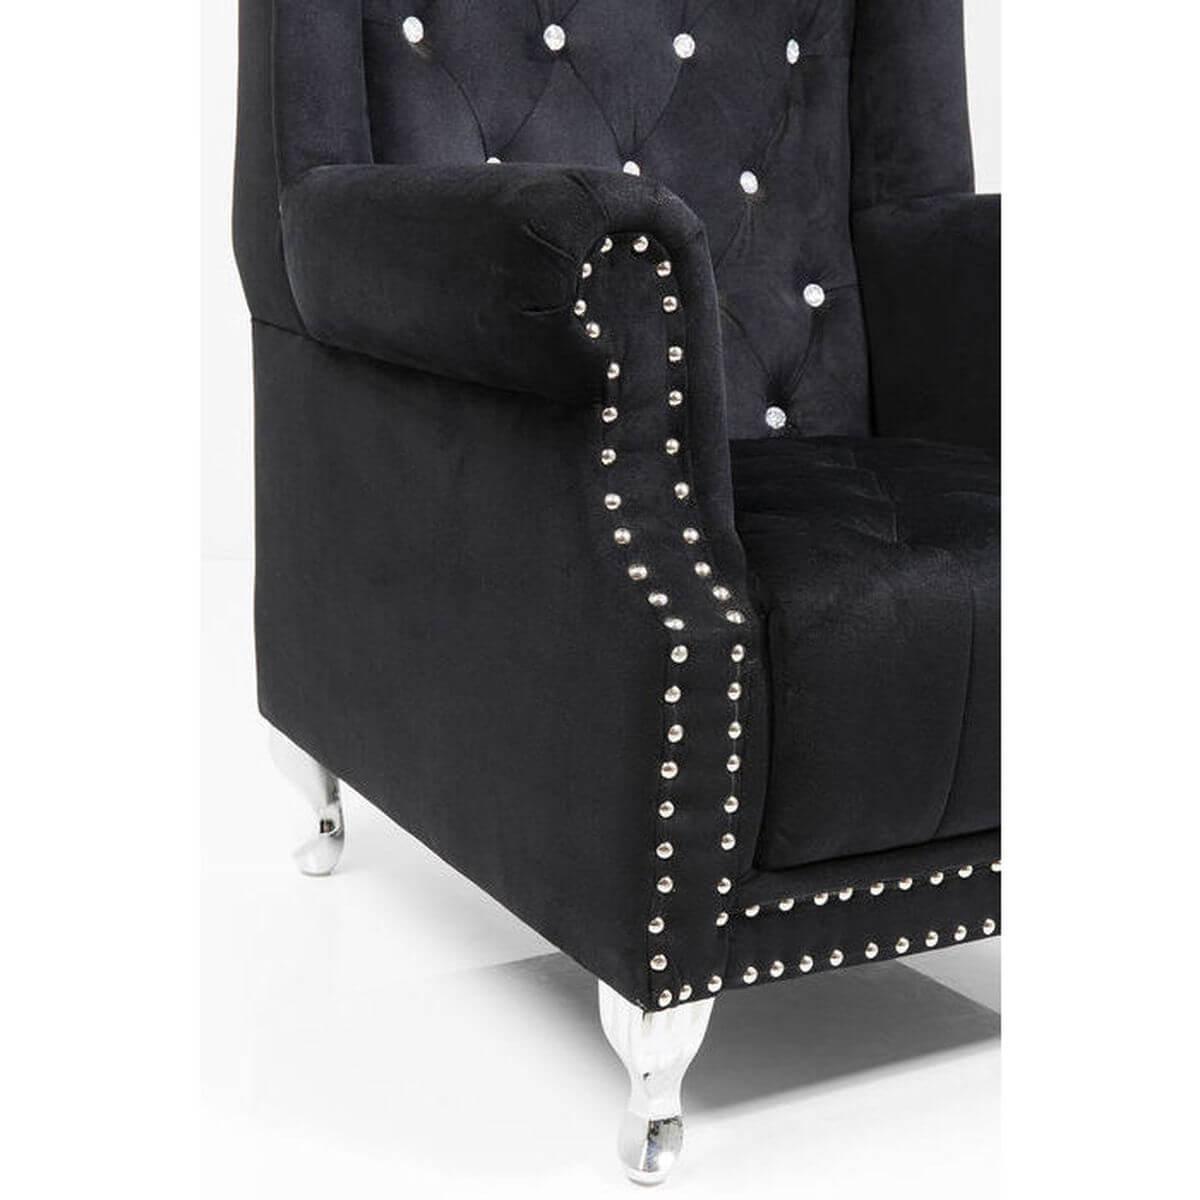 Fauteuil QUEEN Kare Design noir